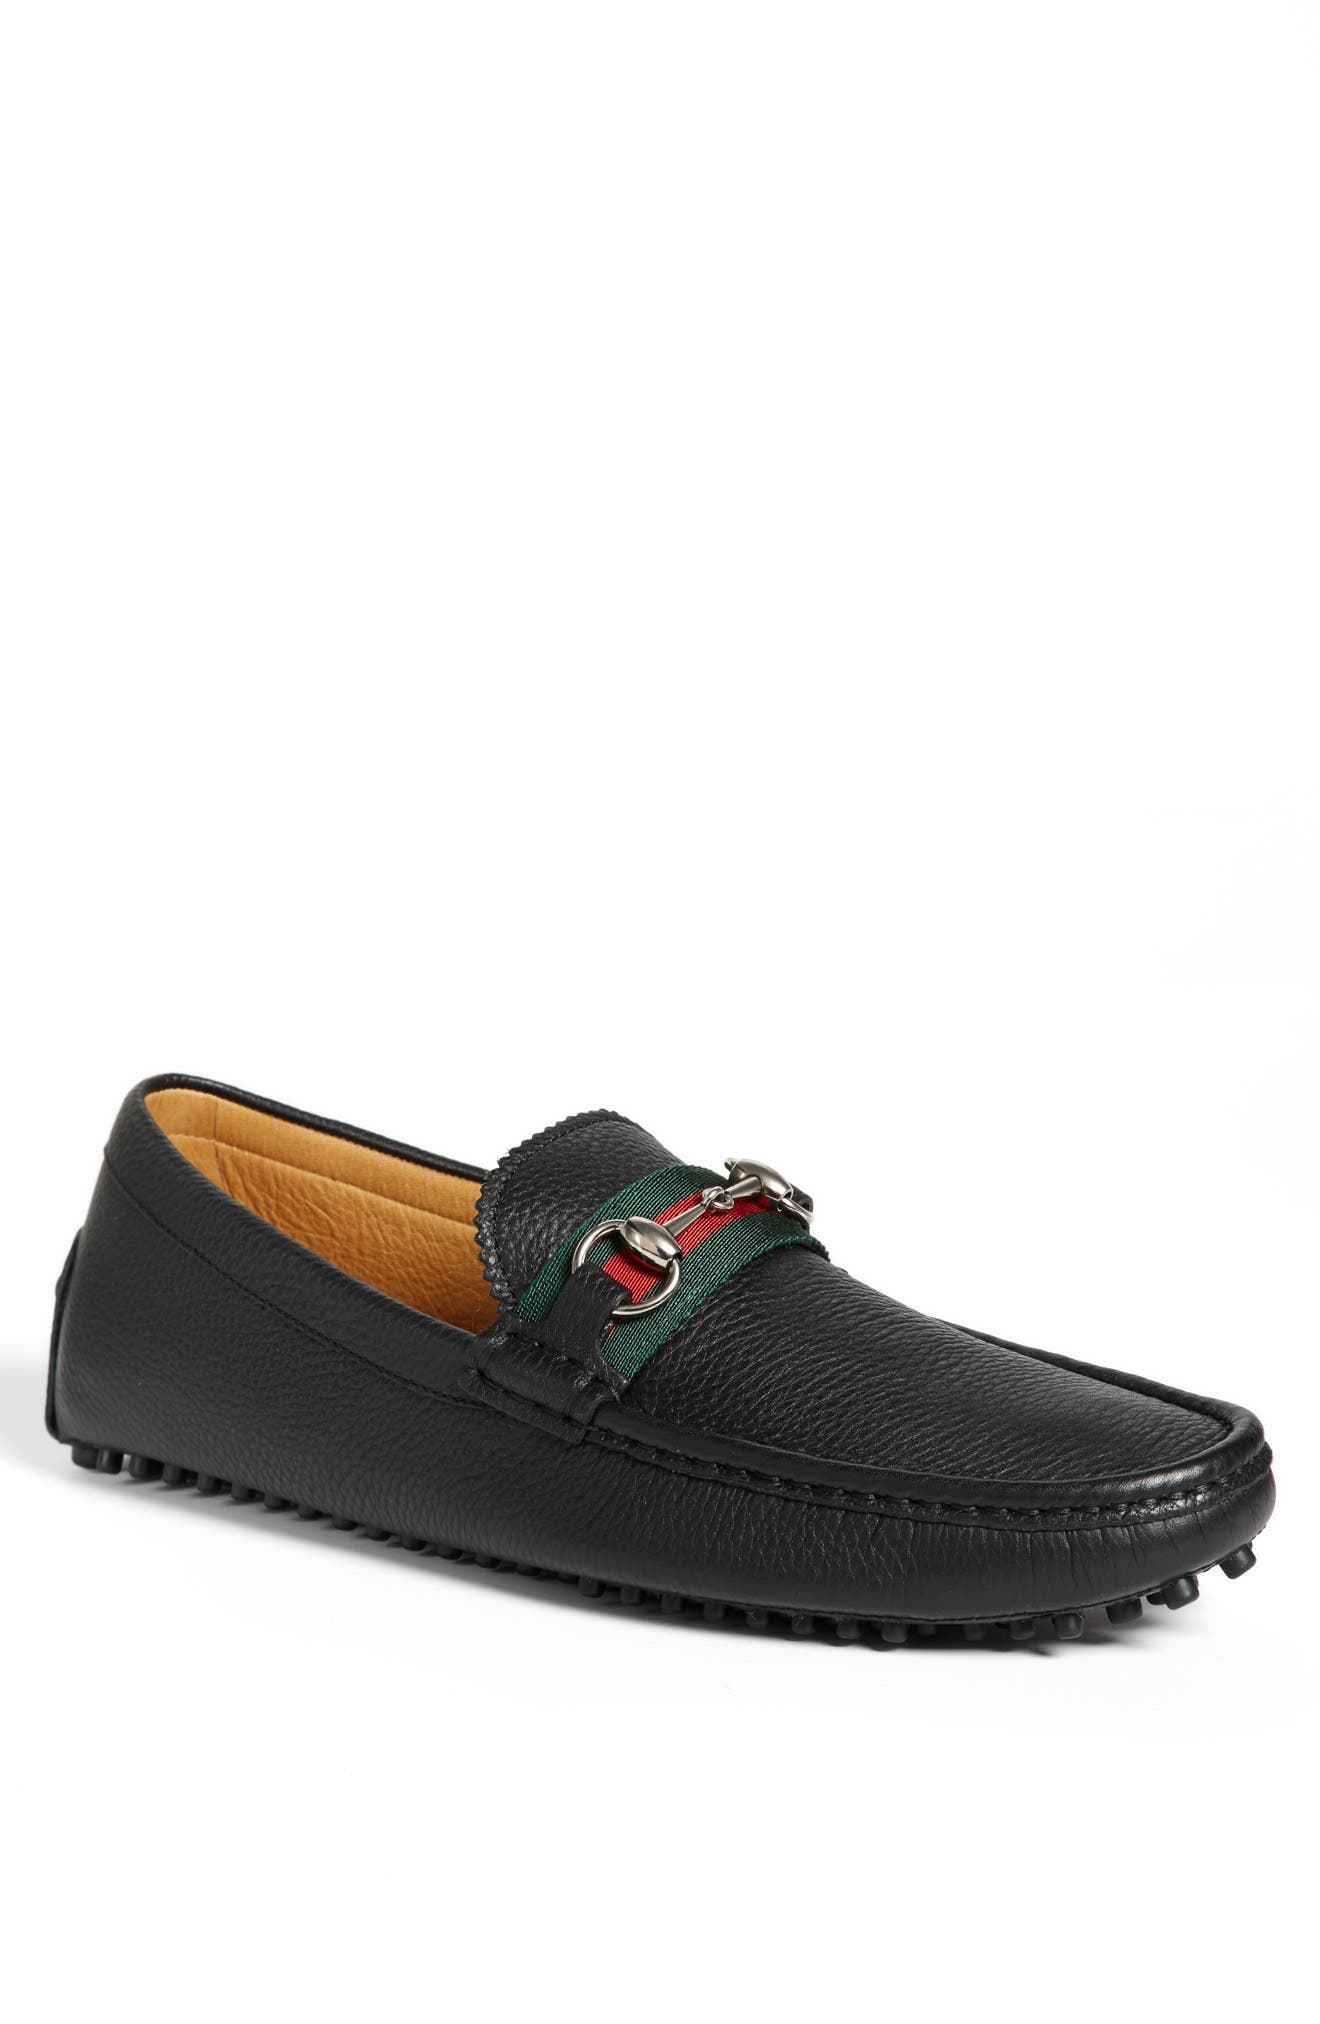 'Damo' Driving Shoe,                         Main,                         color, Black